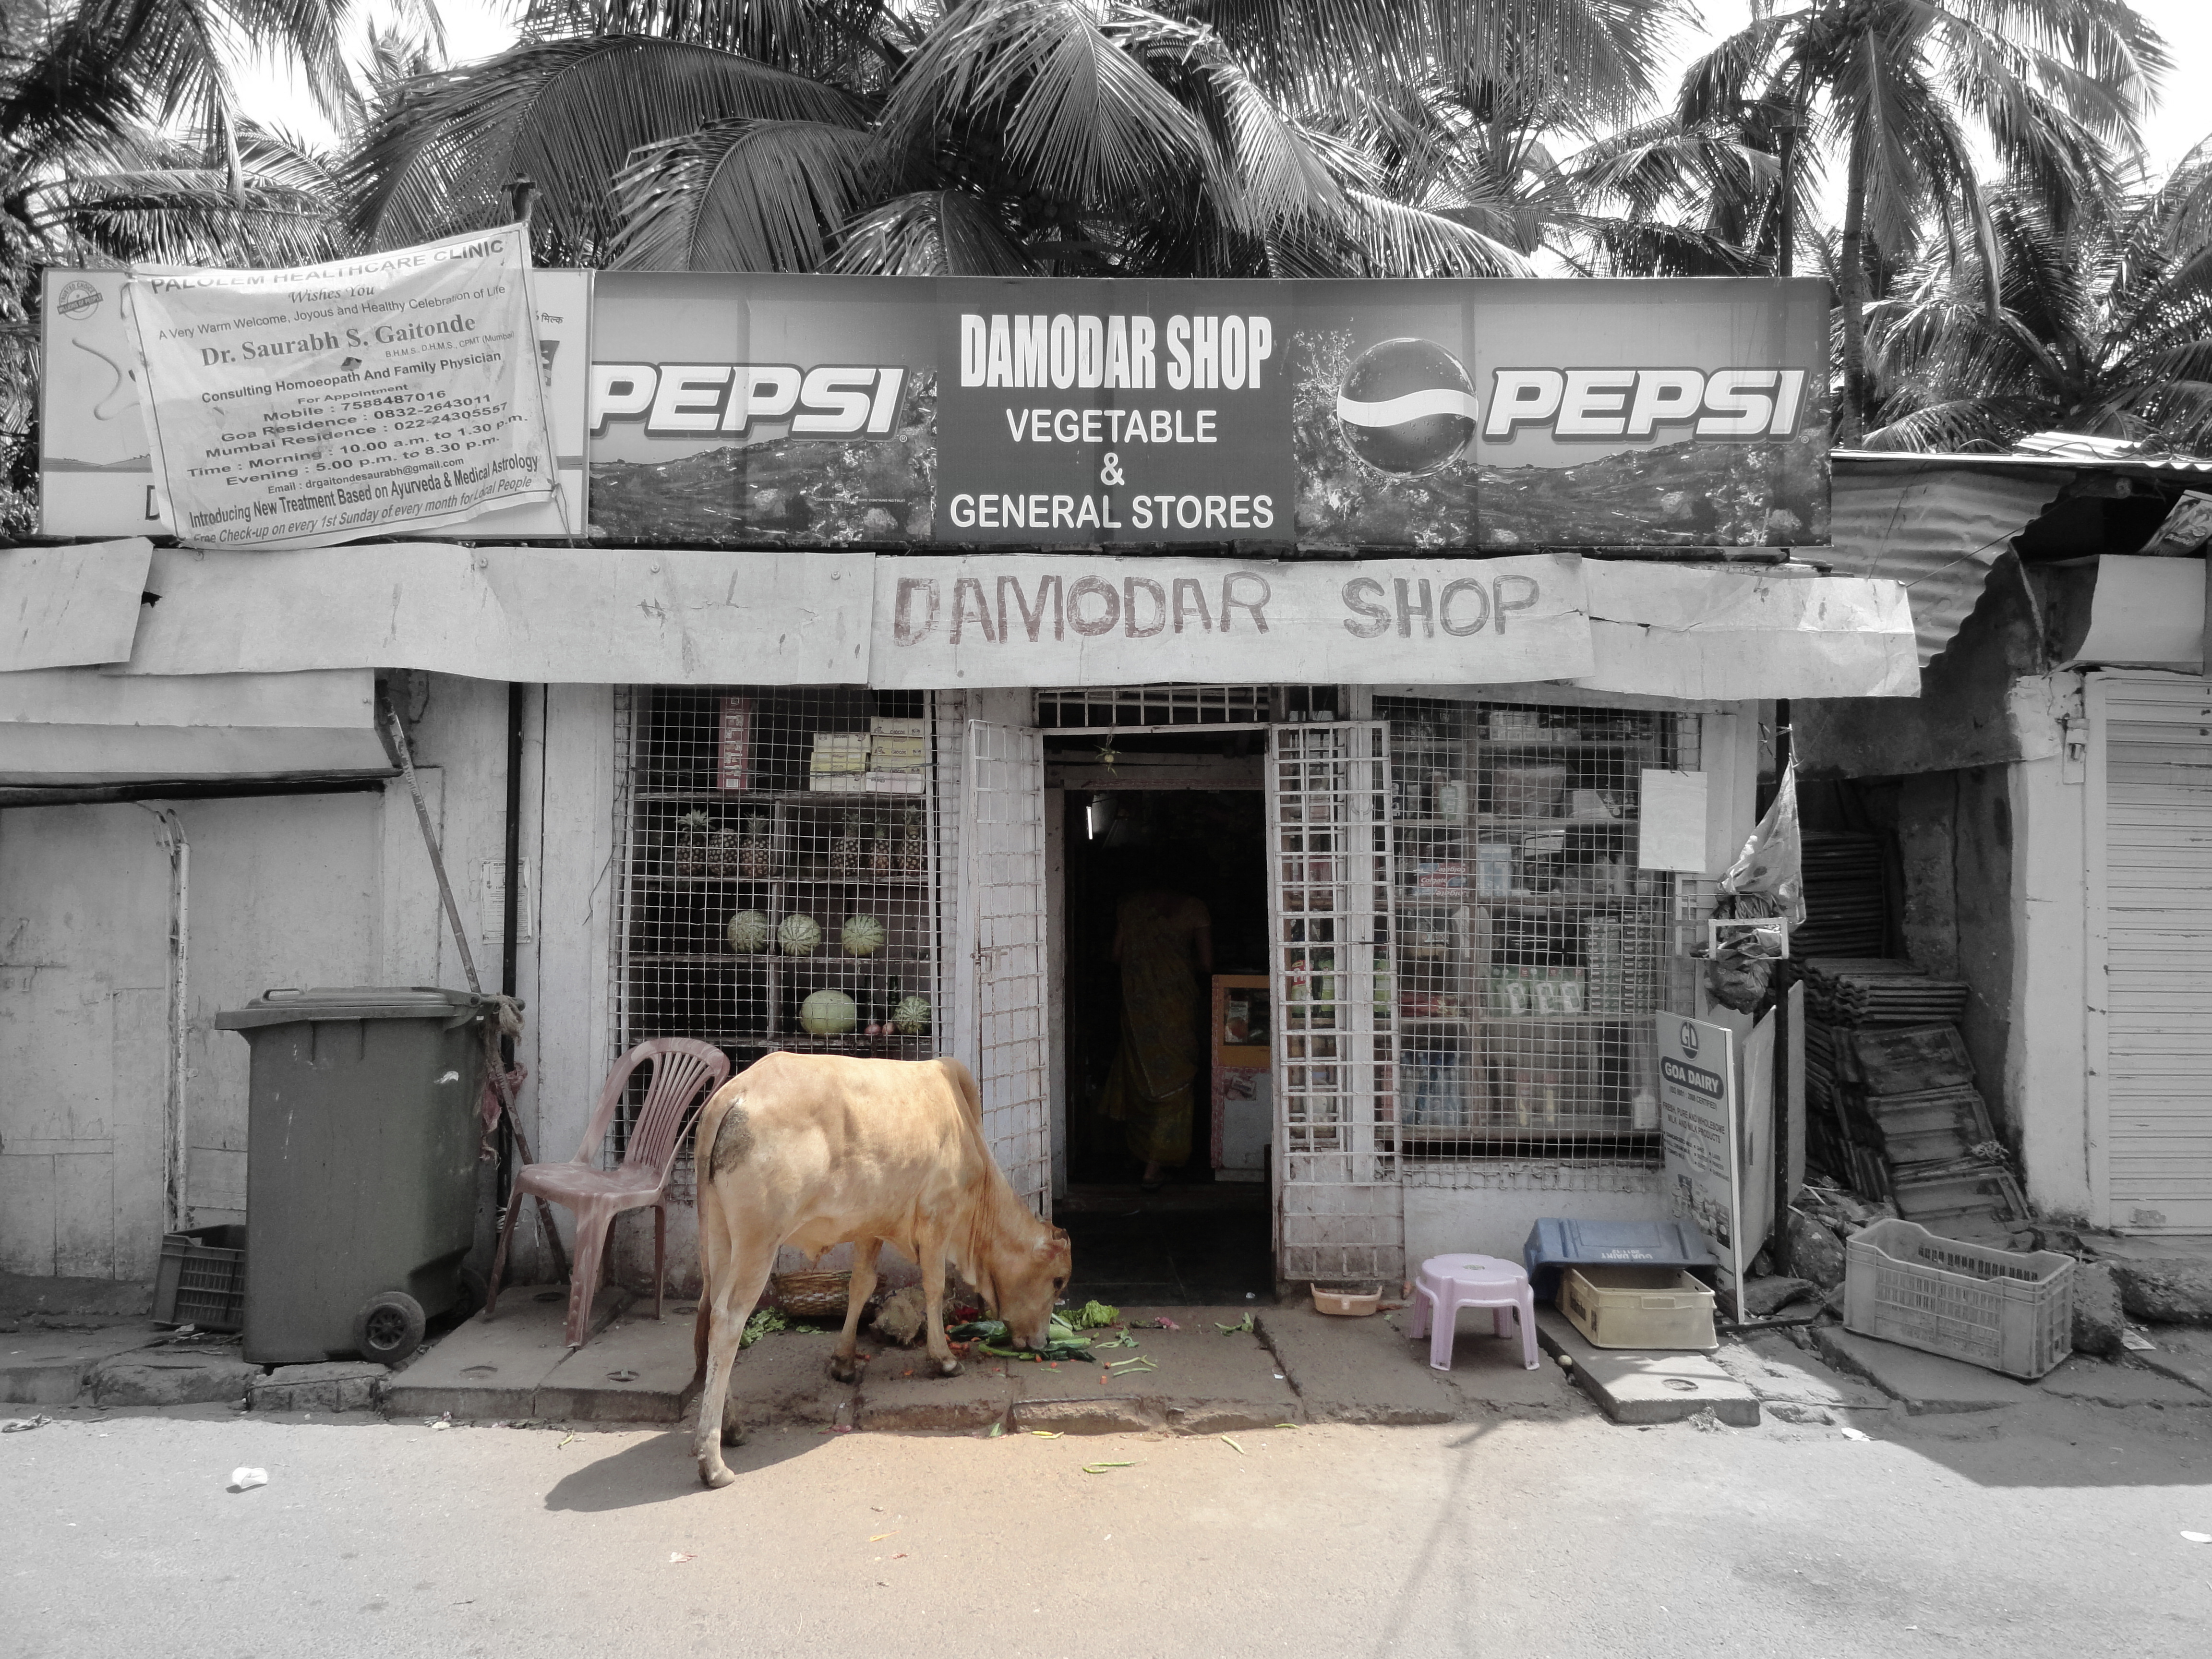 India's cow dilema